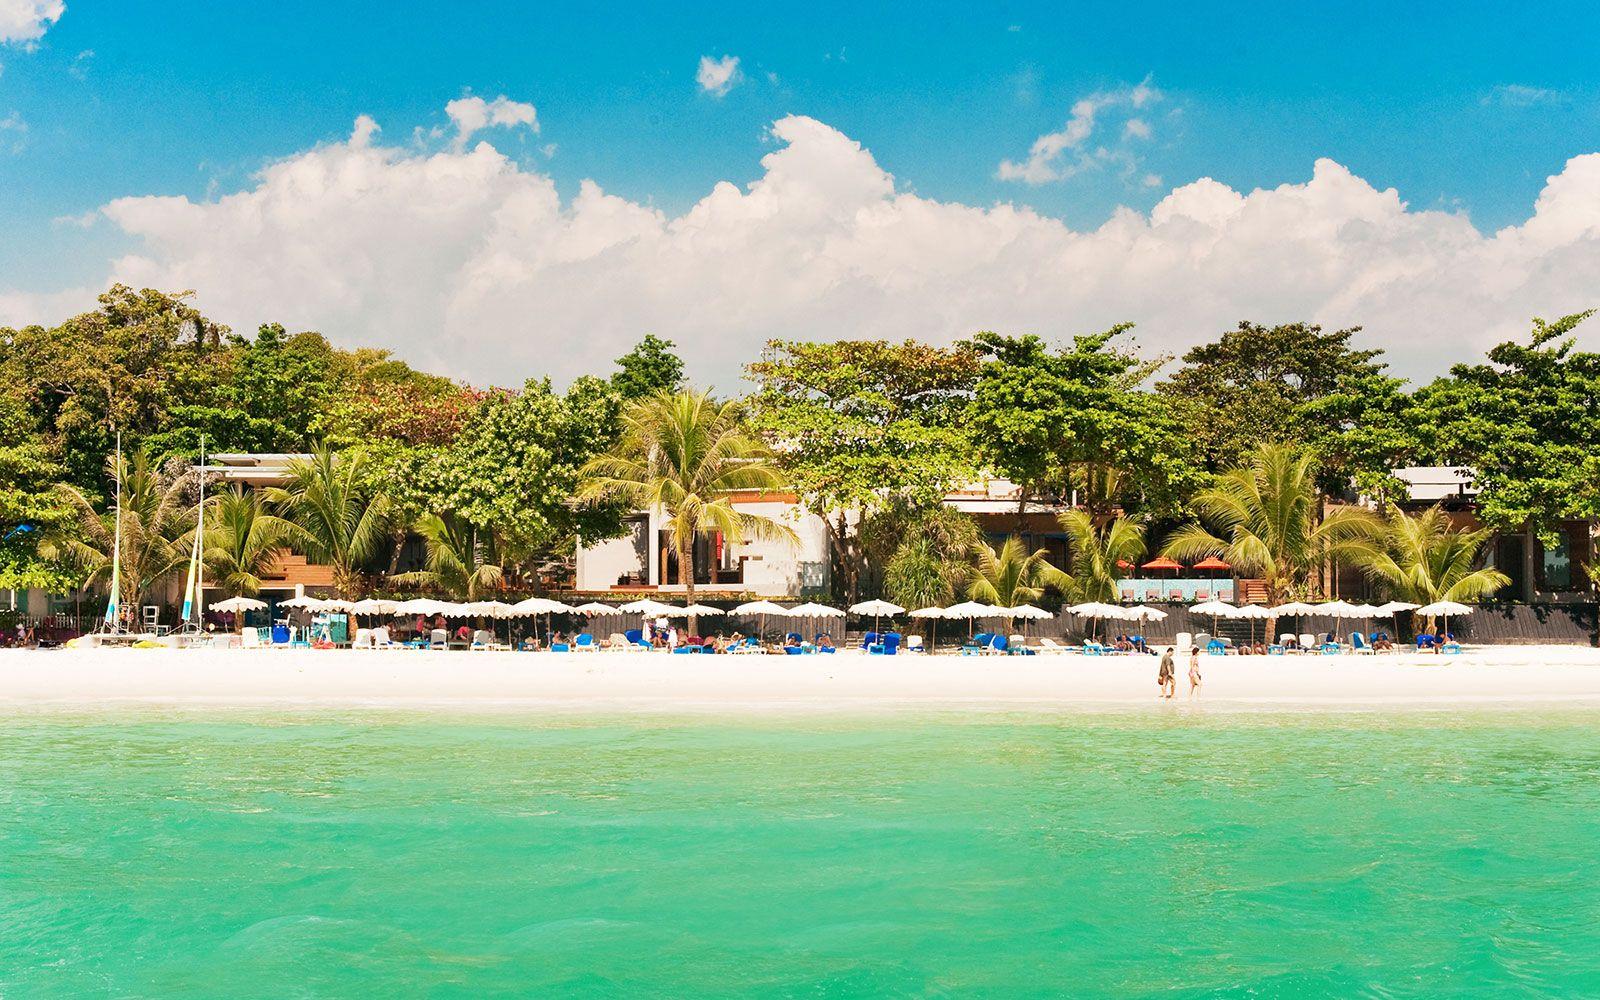 Samed Resorts Sai Kaew Beach Resort On Samet Island Thailand Hotel Official Website